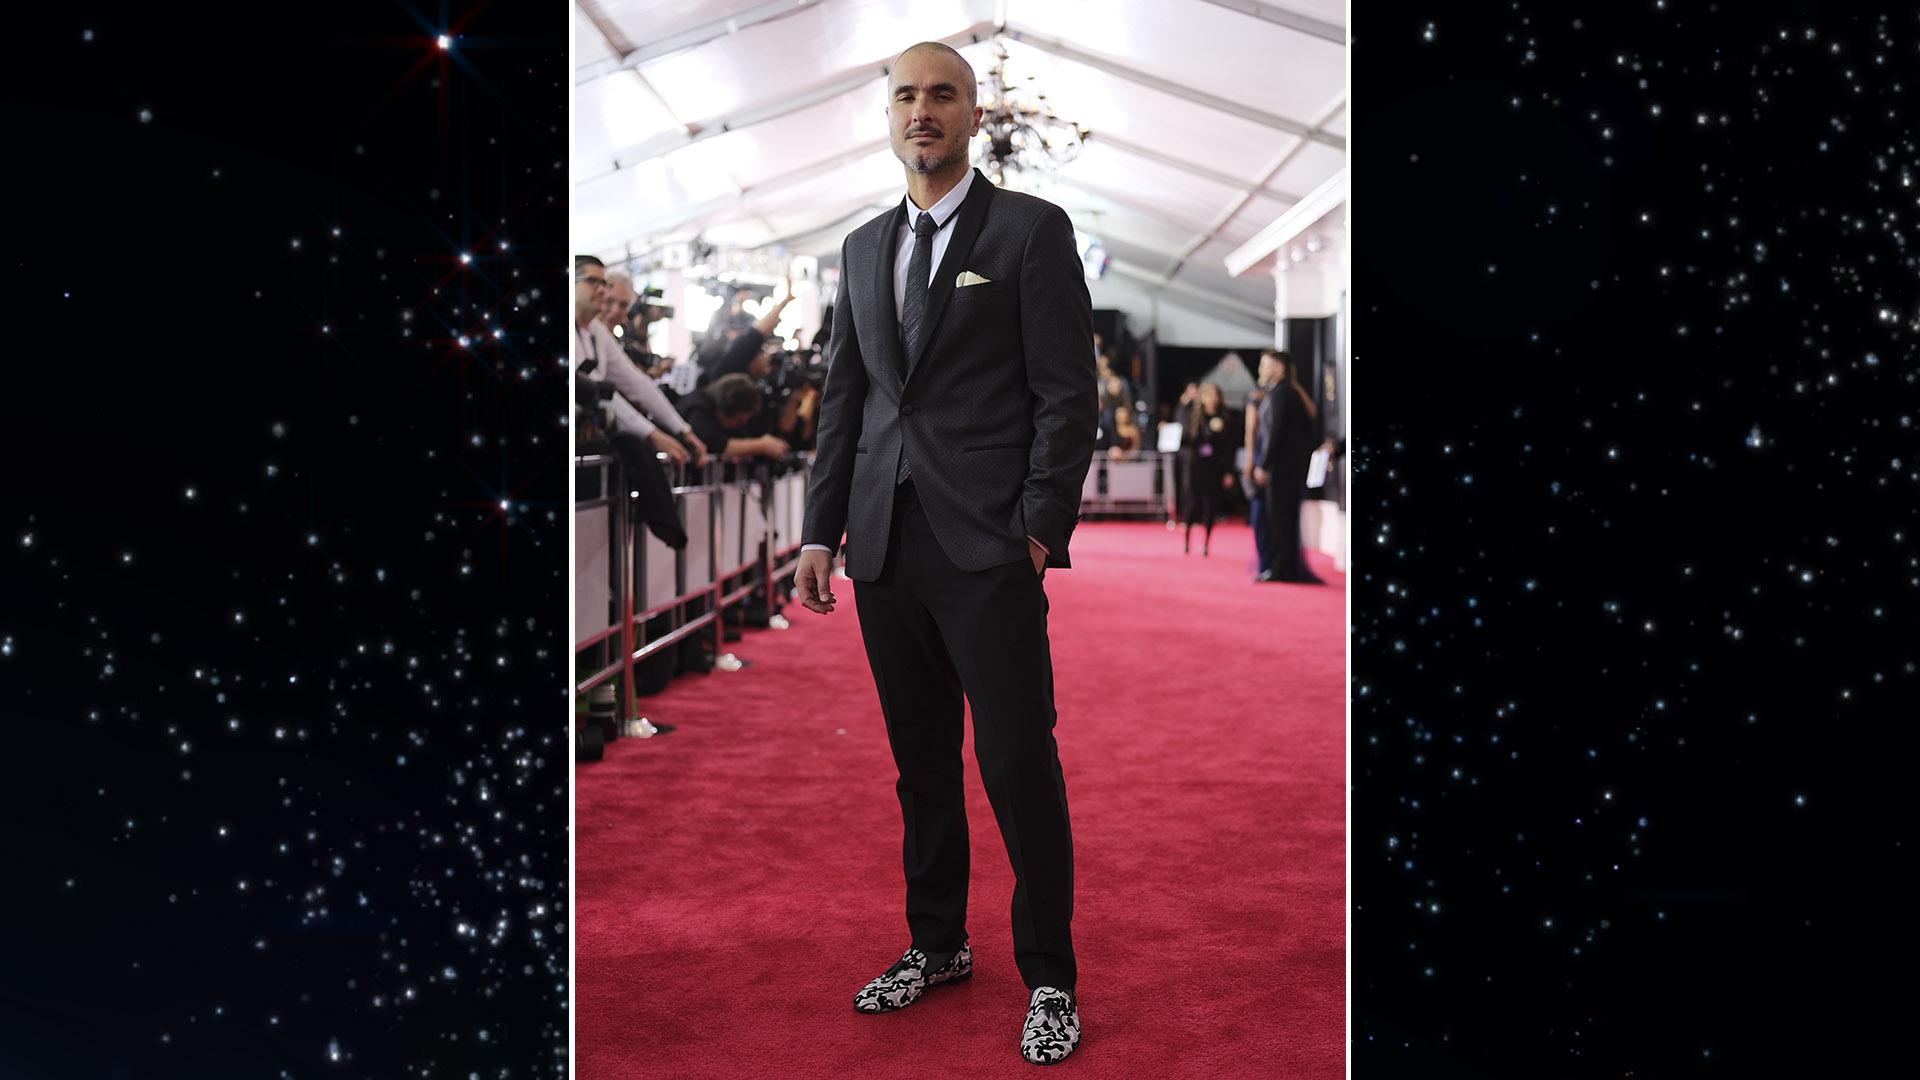 Beats 1 DJ Zane Lowe walks down the GRAMMY red carpet wearing some pretty swanky loafers.